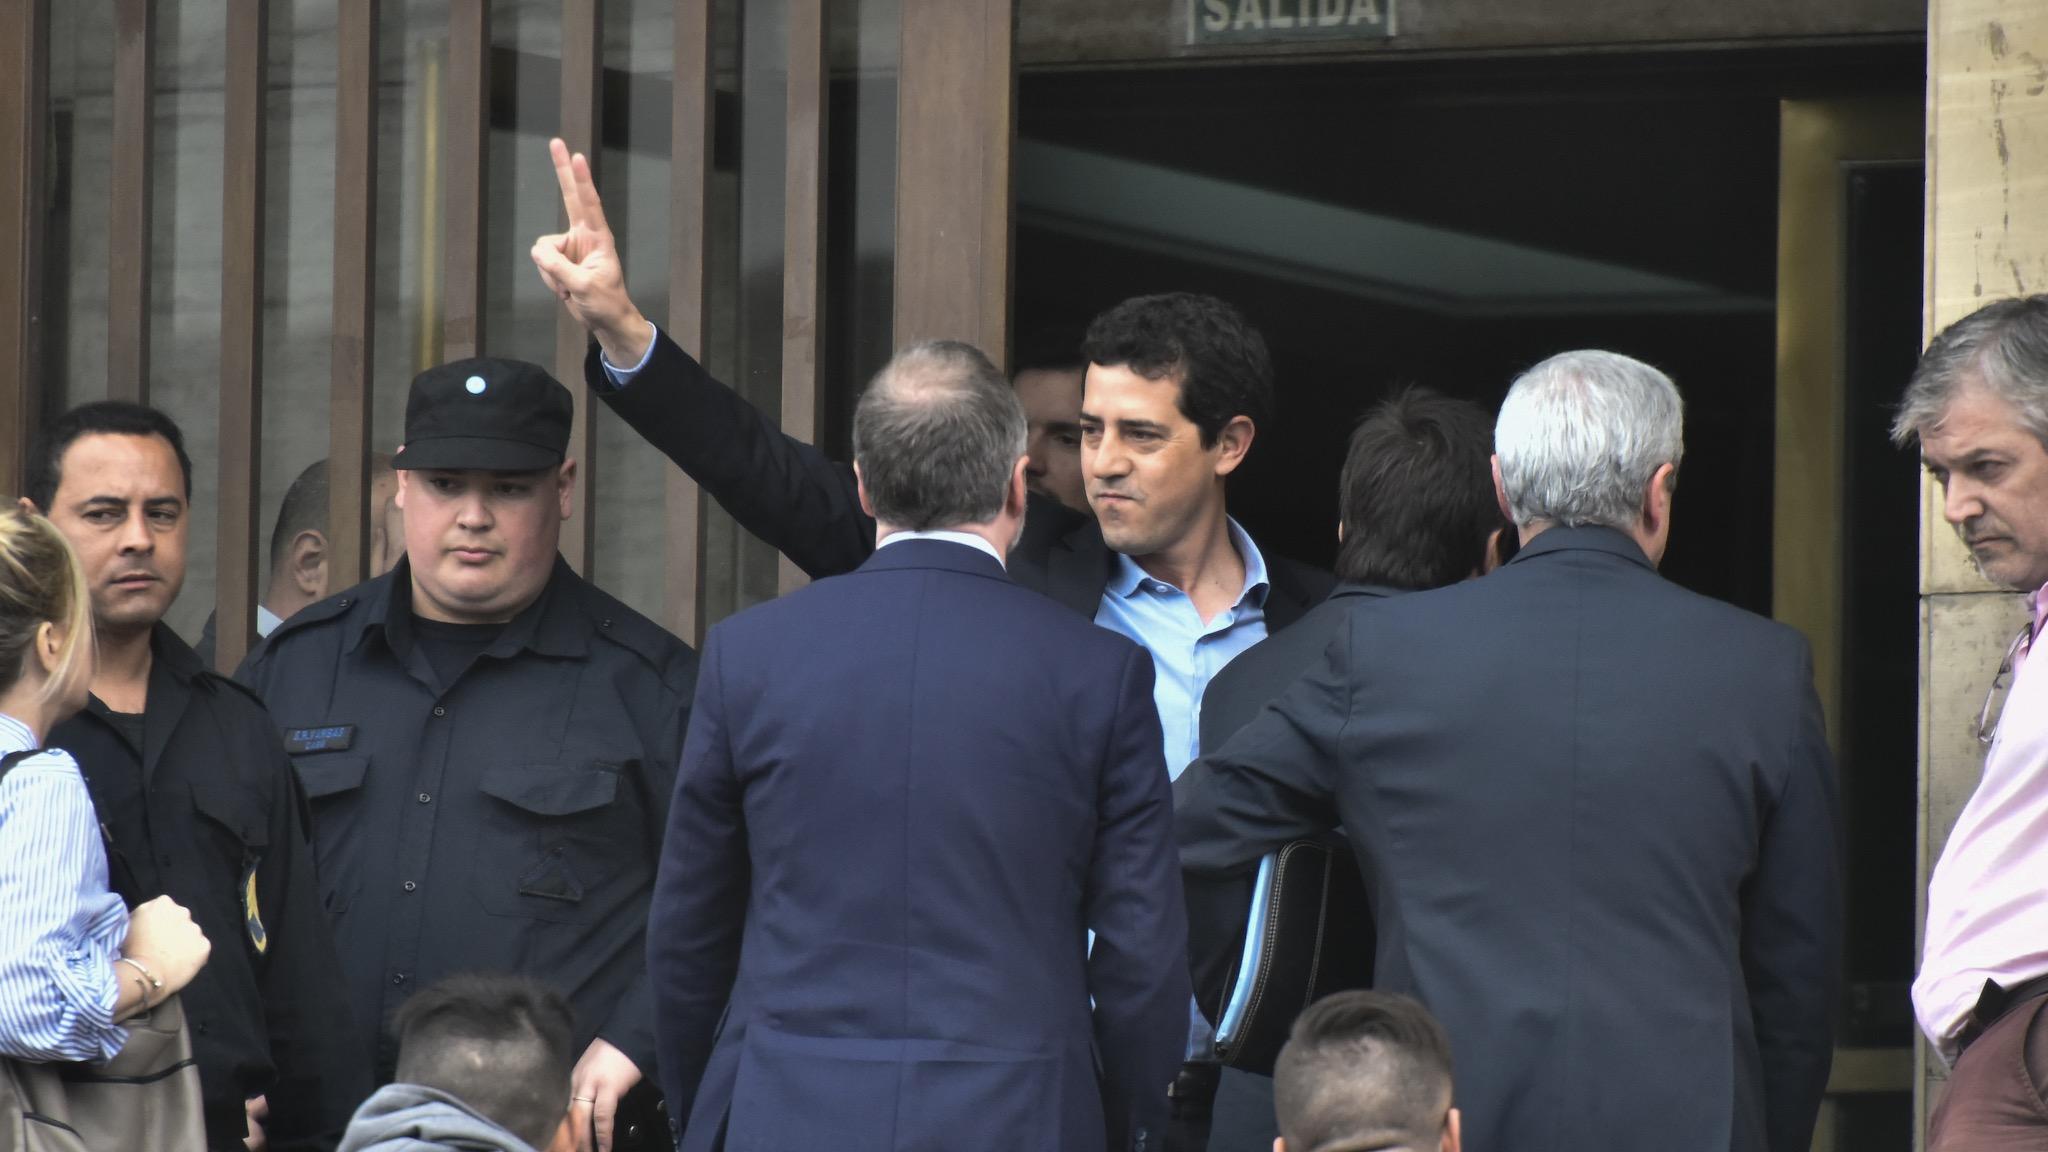 Eduardo Wado de Pedro saluda con la V de la victoria